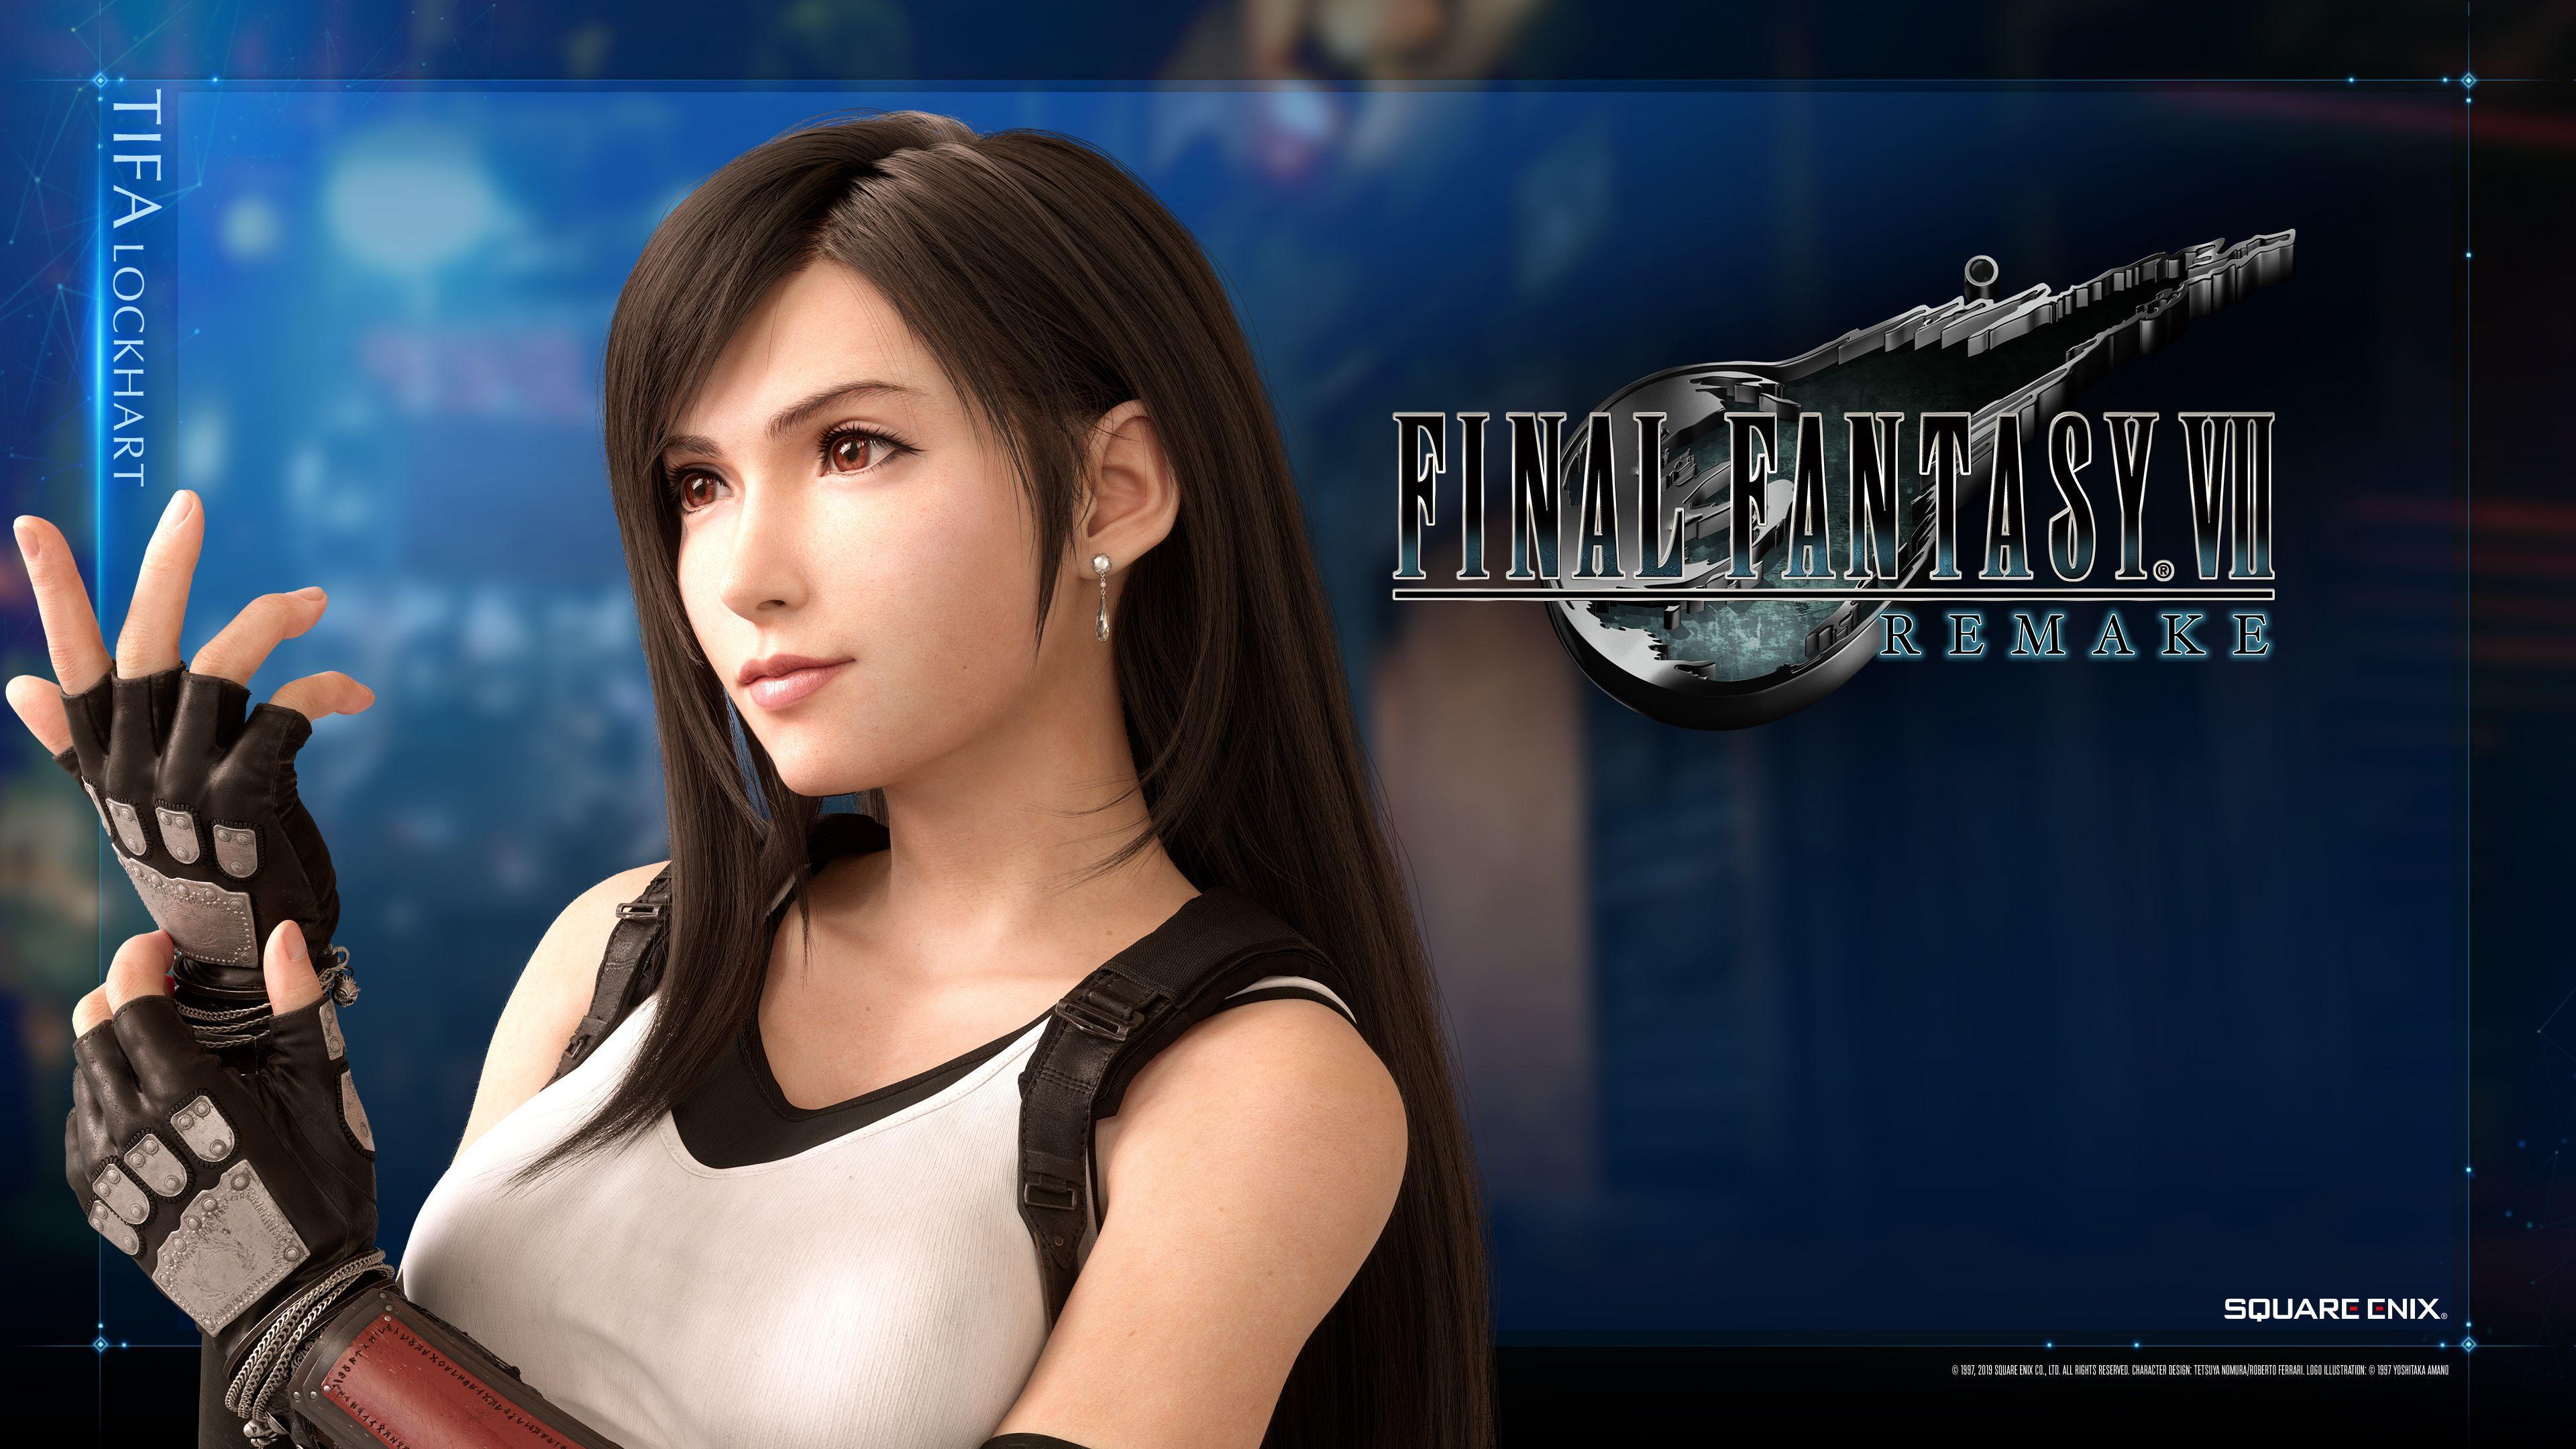 Final Fantasy Vii Remake Wallpapers Top Free Final Fantasy Vii